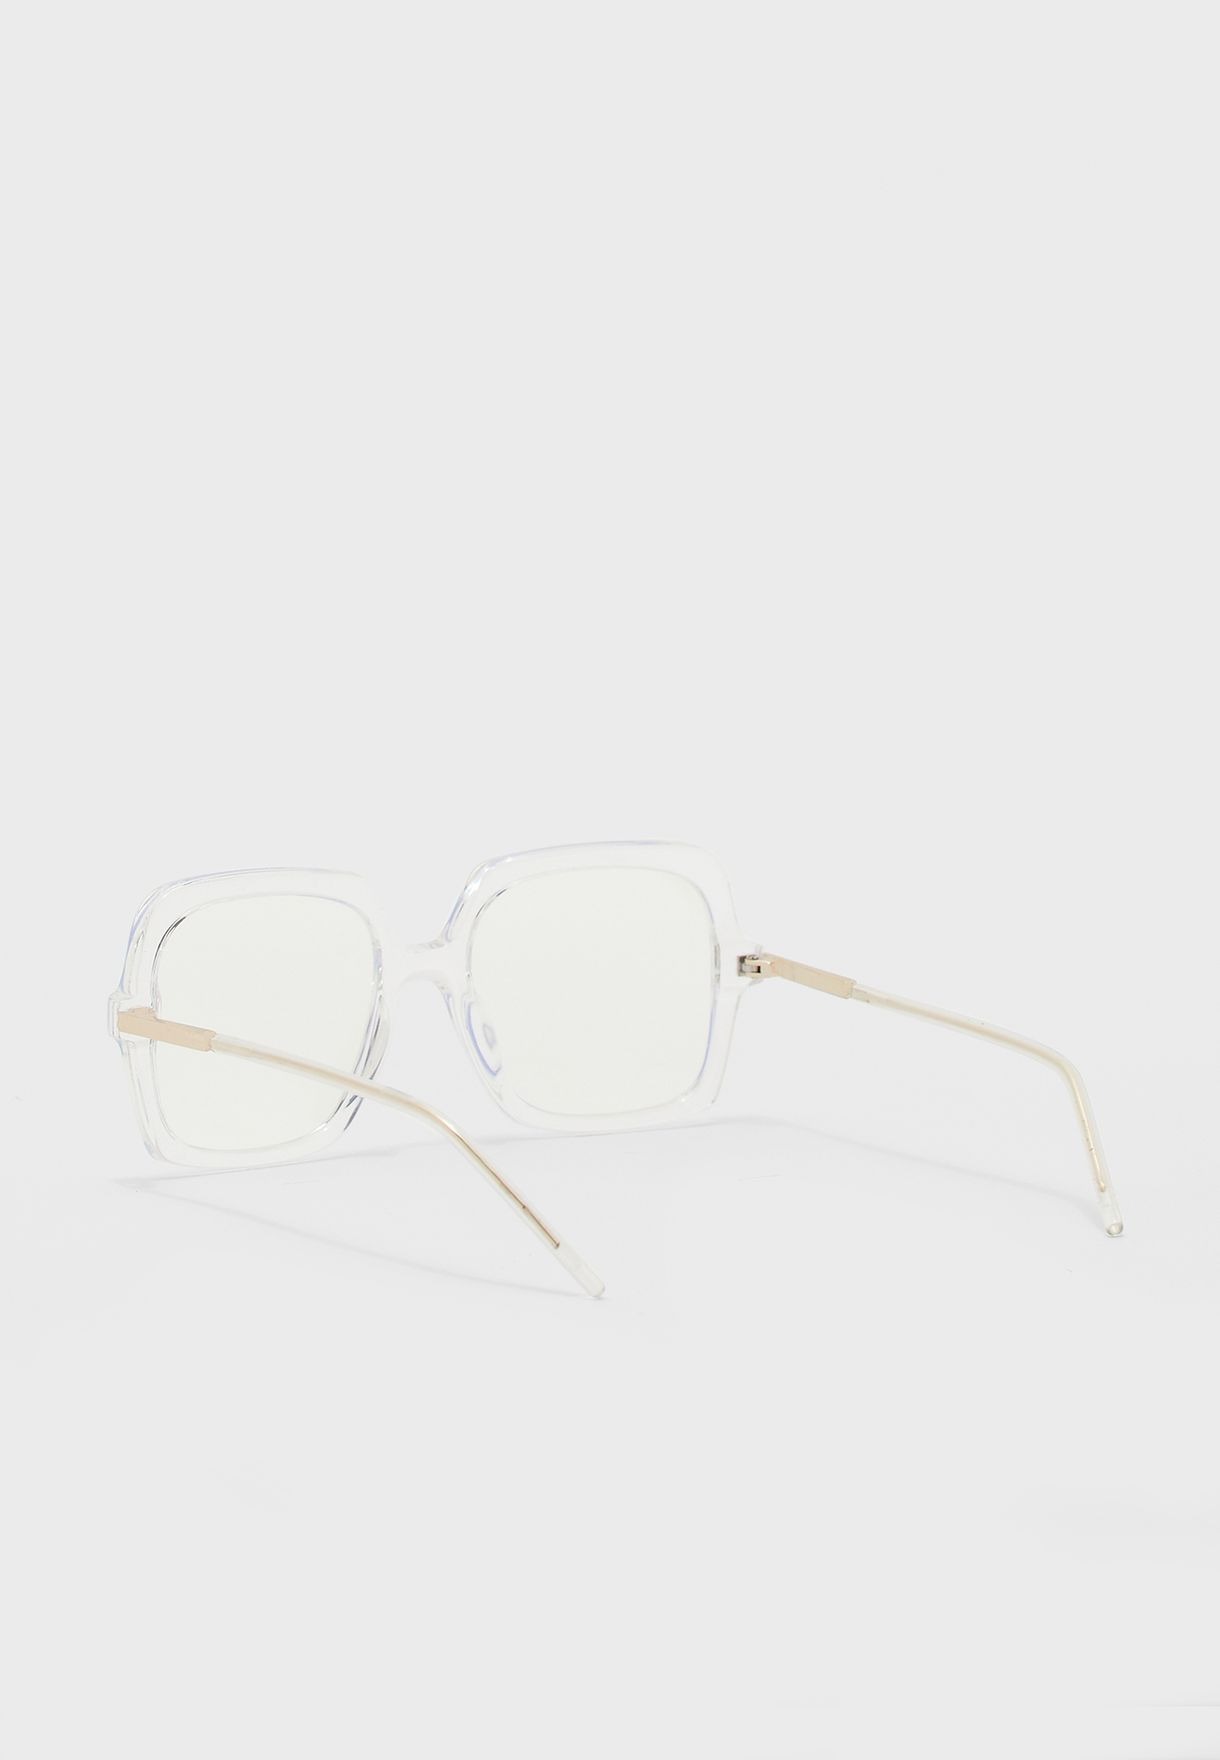 Cucla Sunglasses